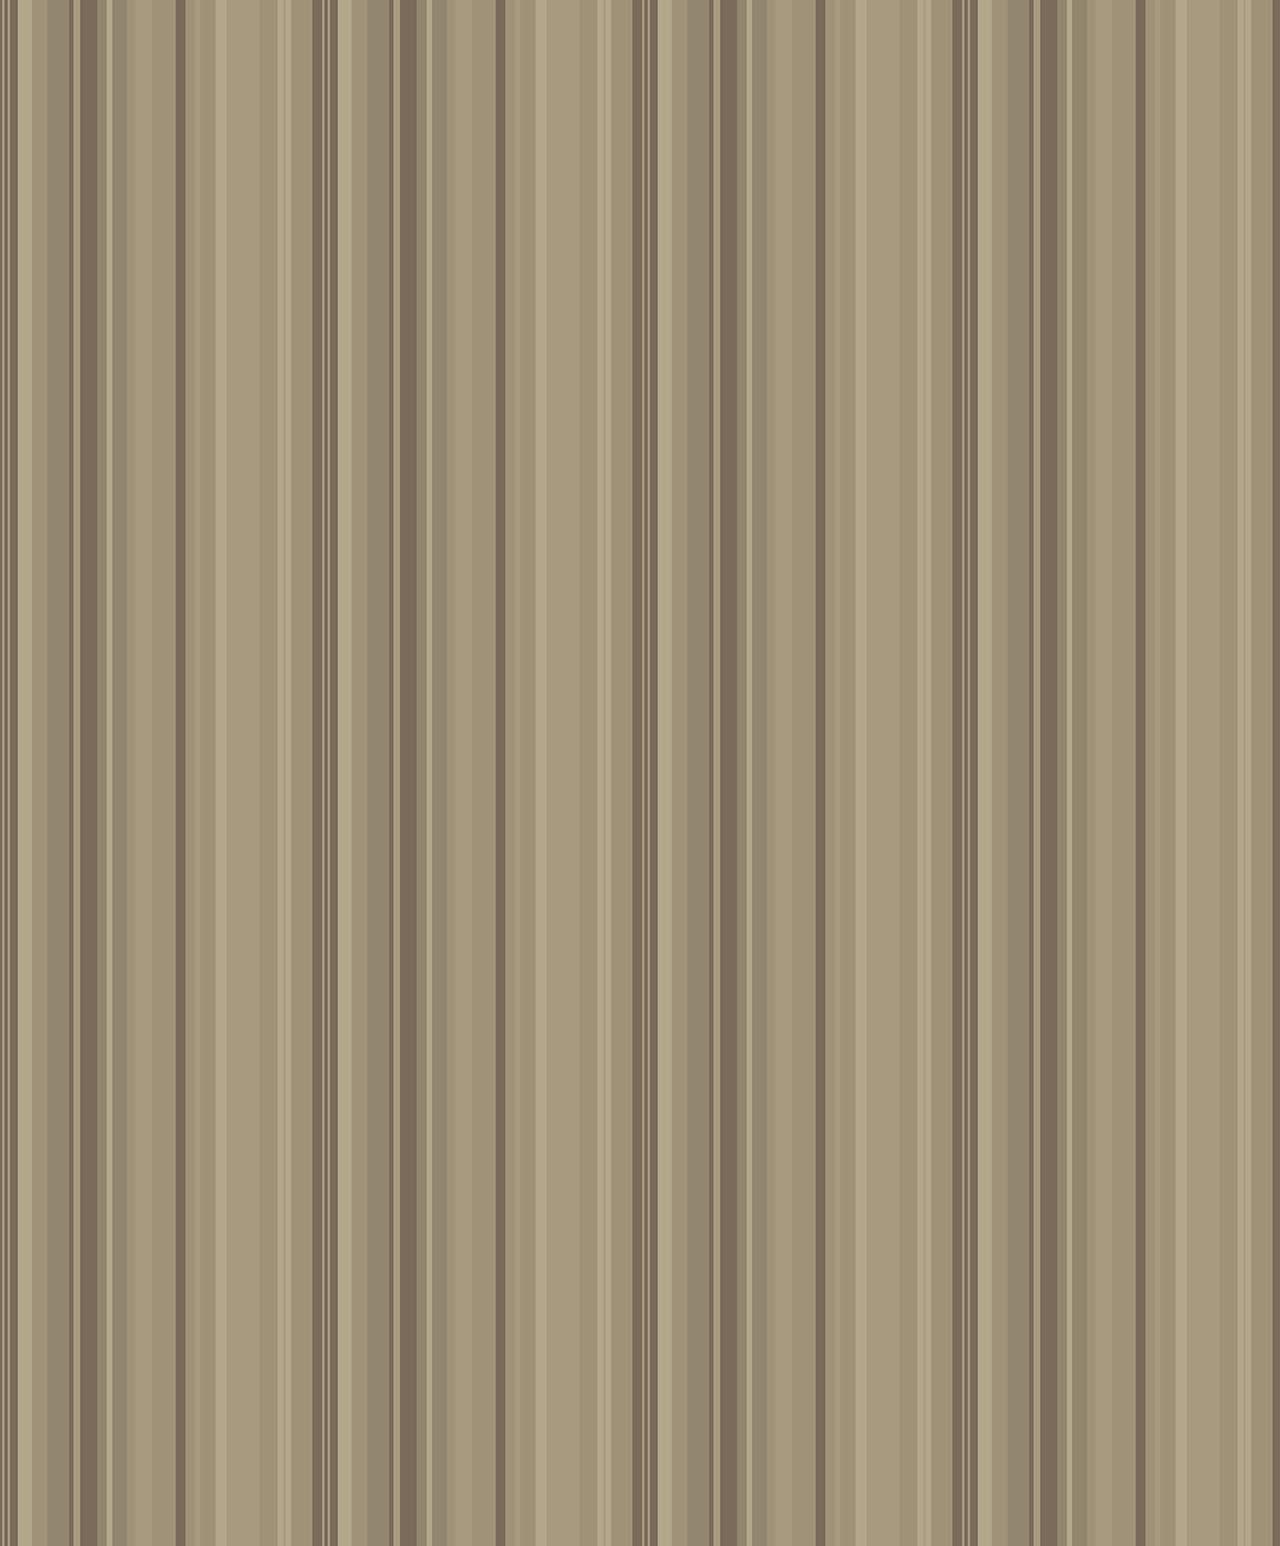 BARCODE GOLD A decadence wallpaper-DC00185